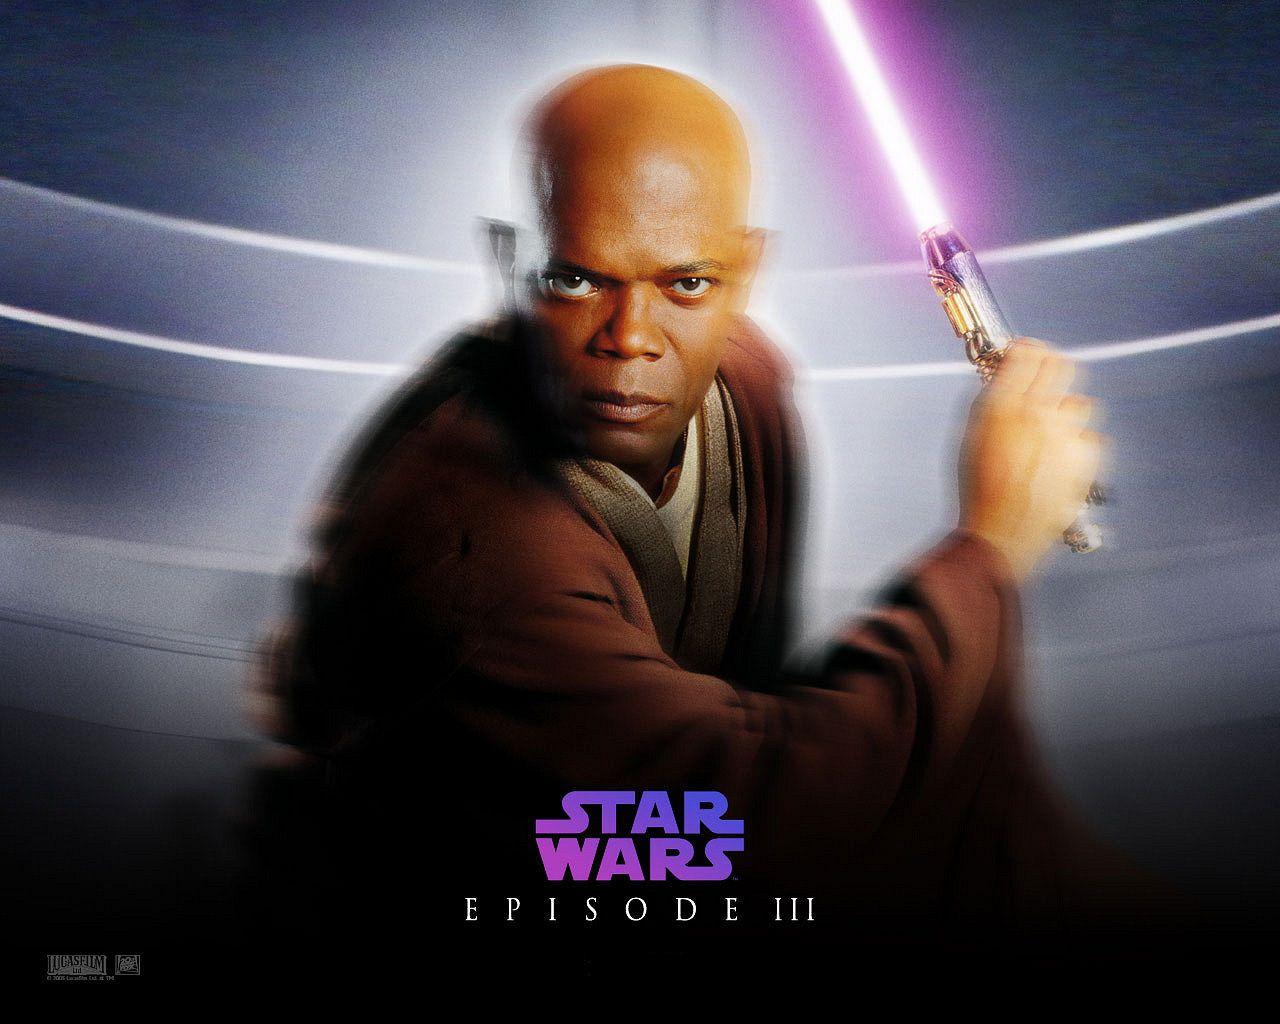 Mace Windu Star wars website Star war episode 3 Star wars 1280x1024